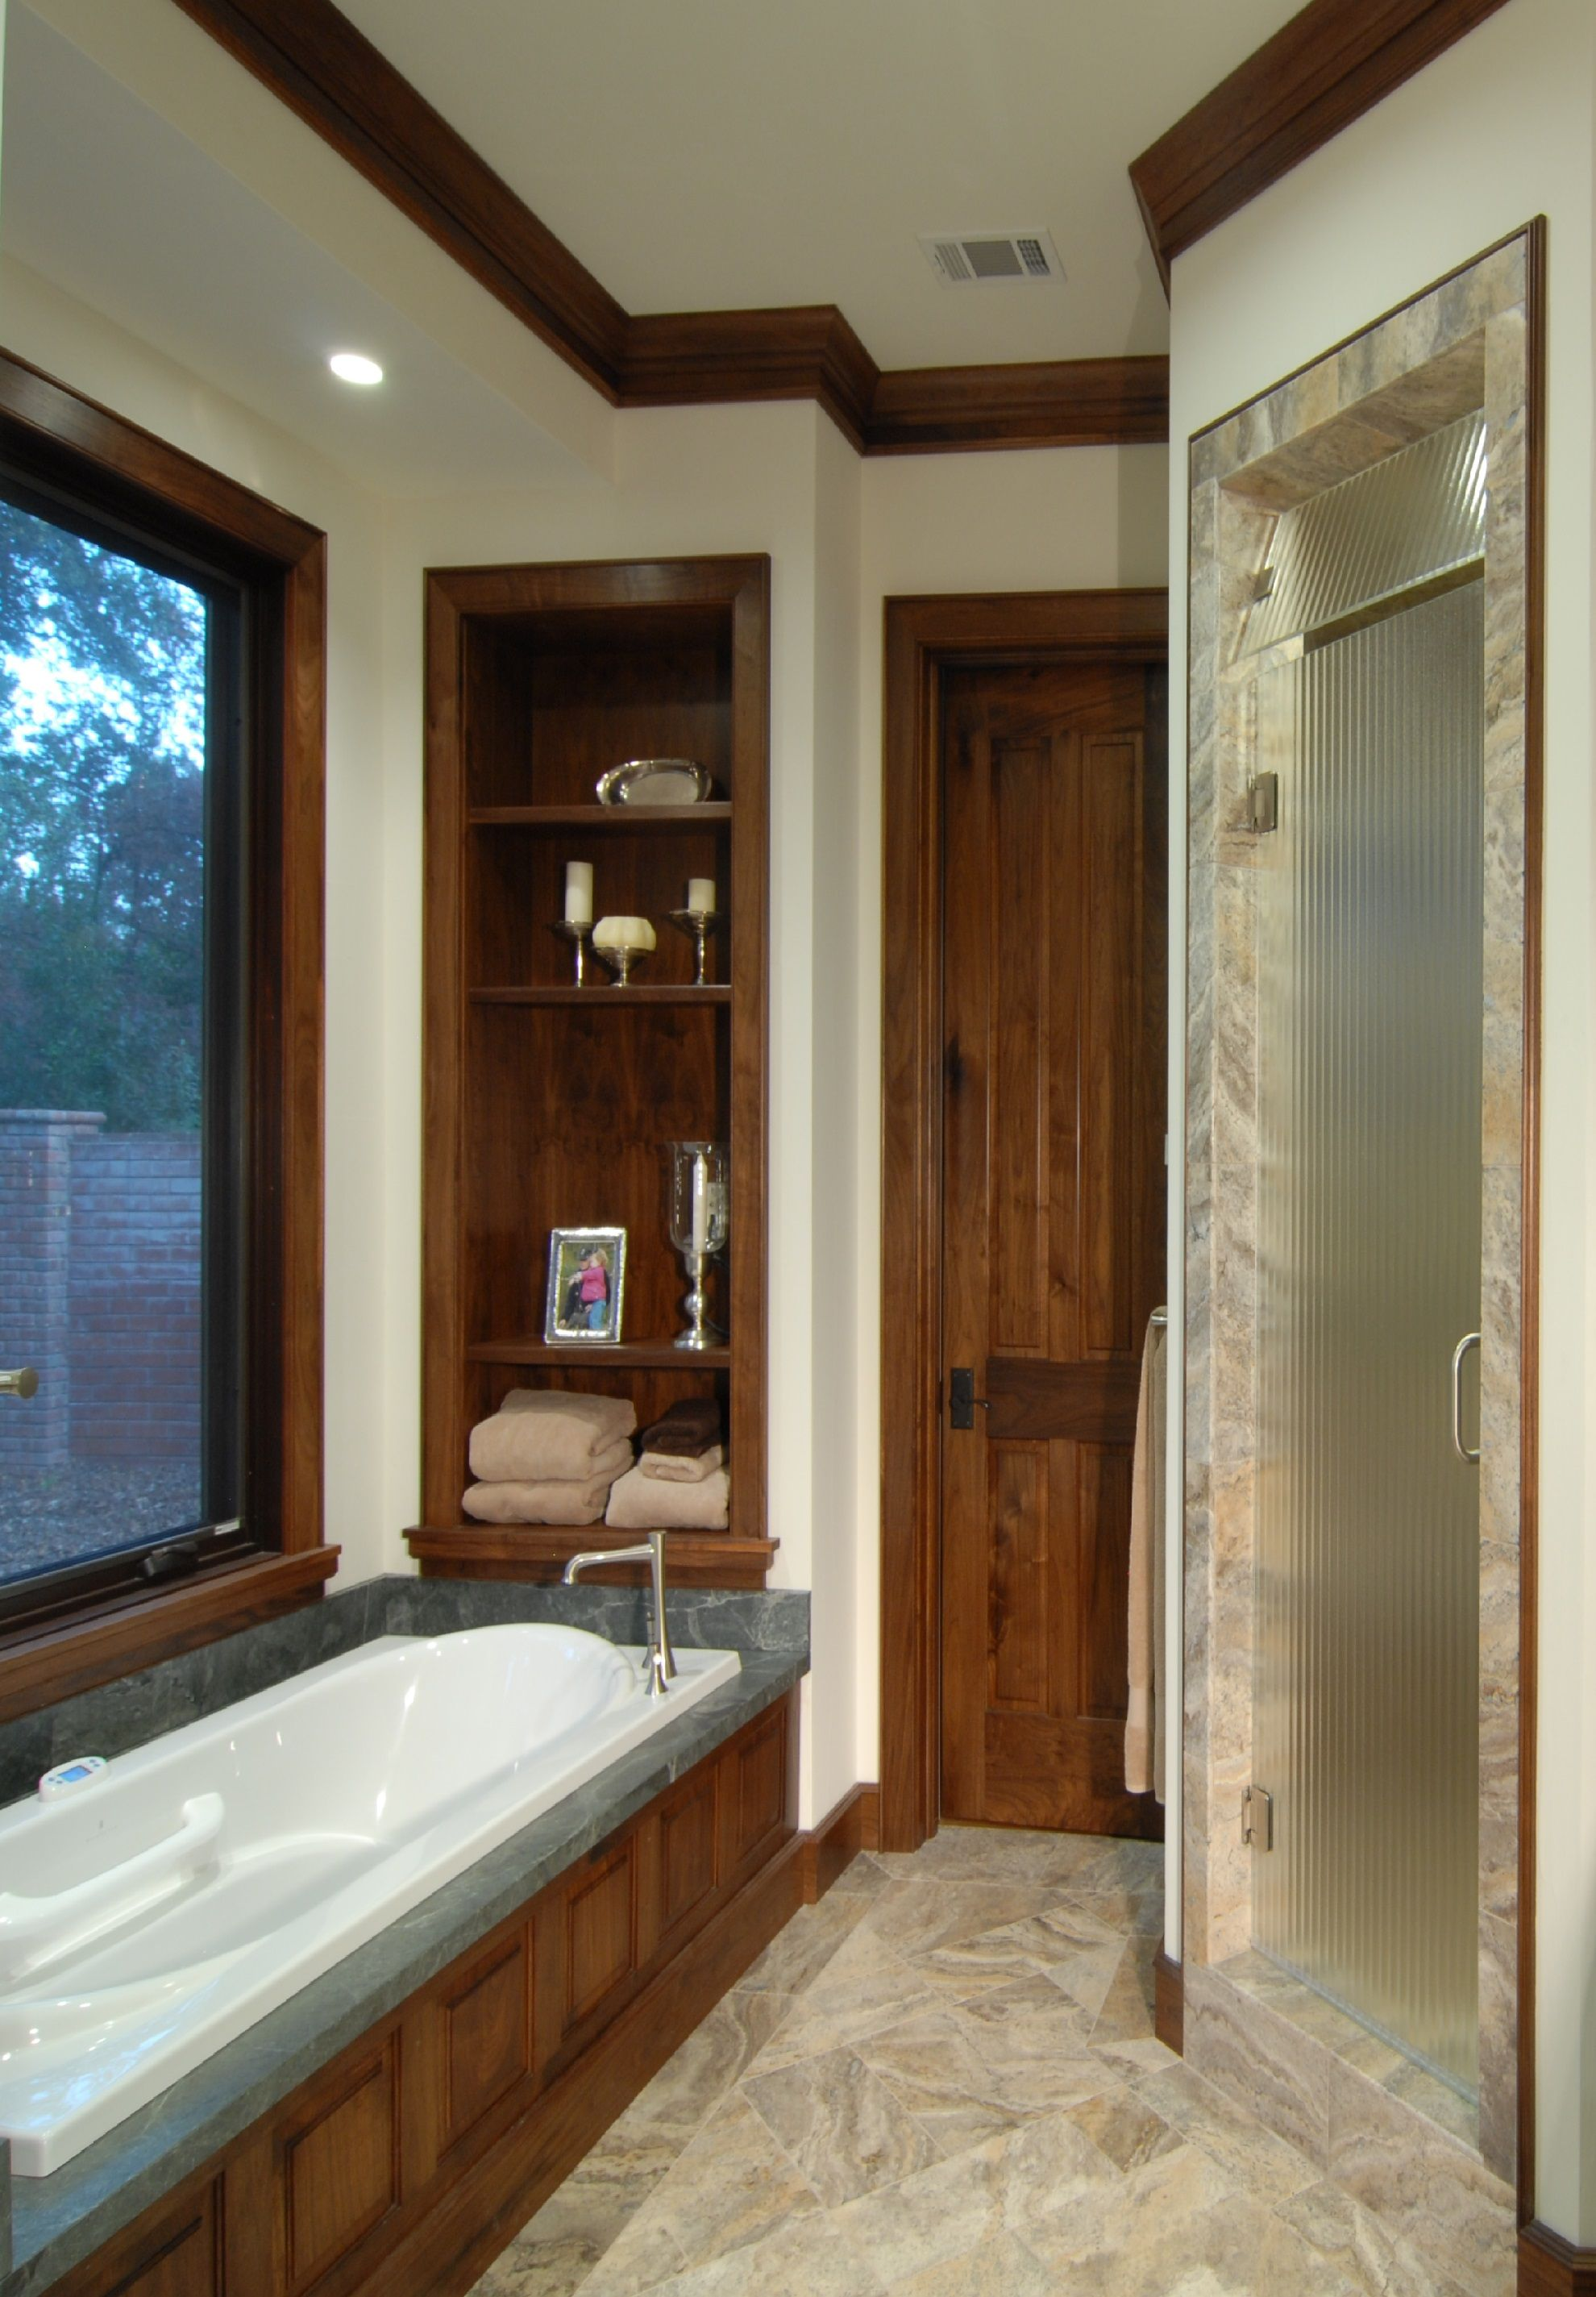 Trophy Room Design Ideas: Trophy Rooms, Fine Woodworking, Design